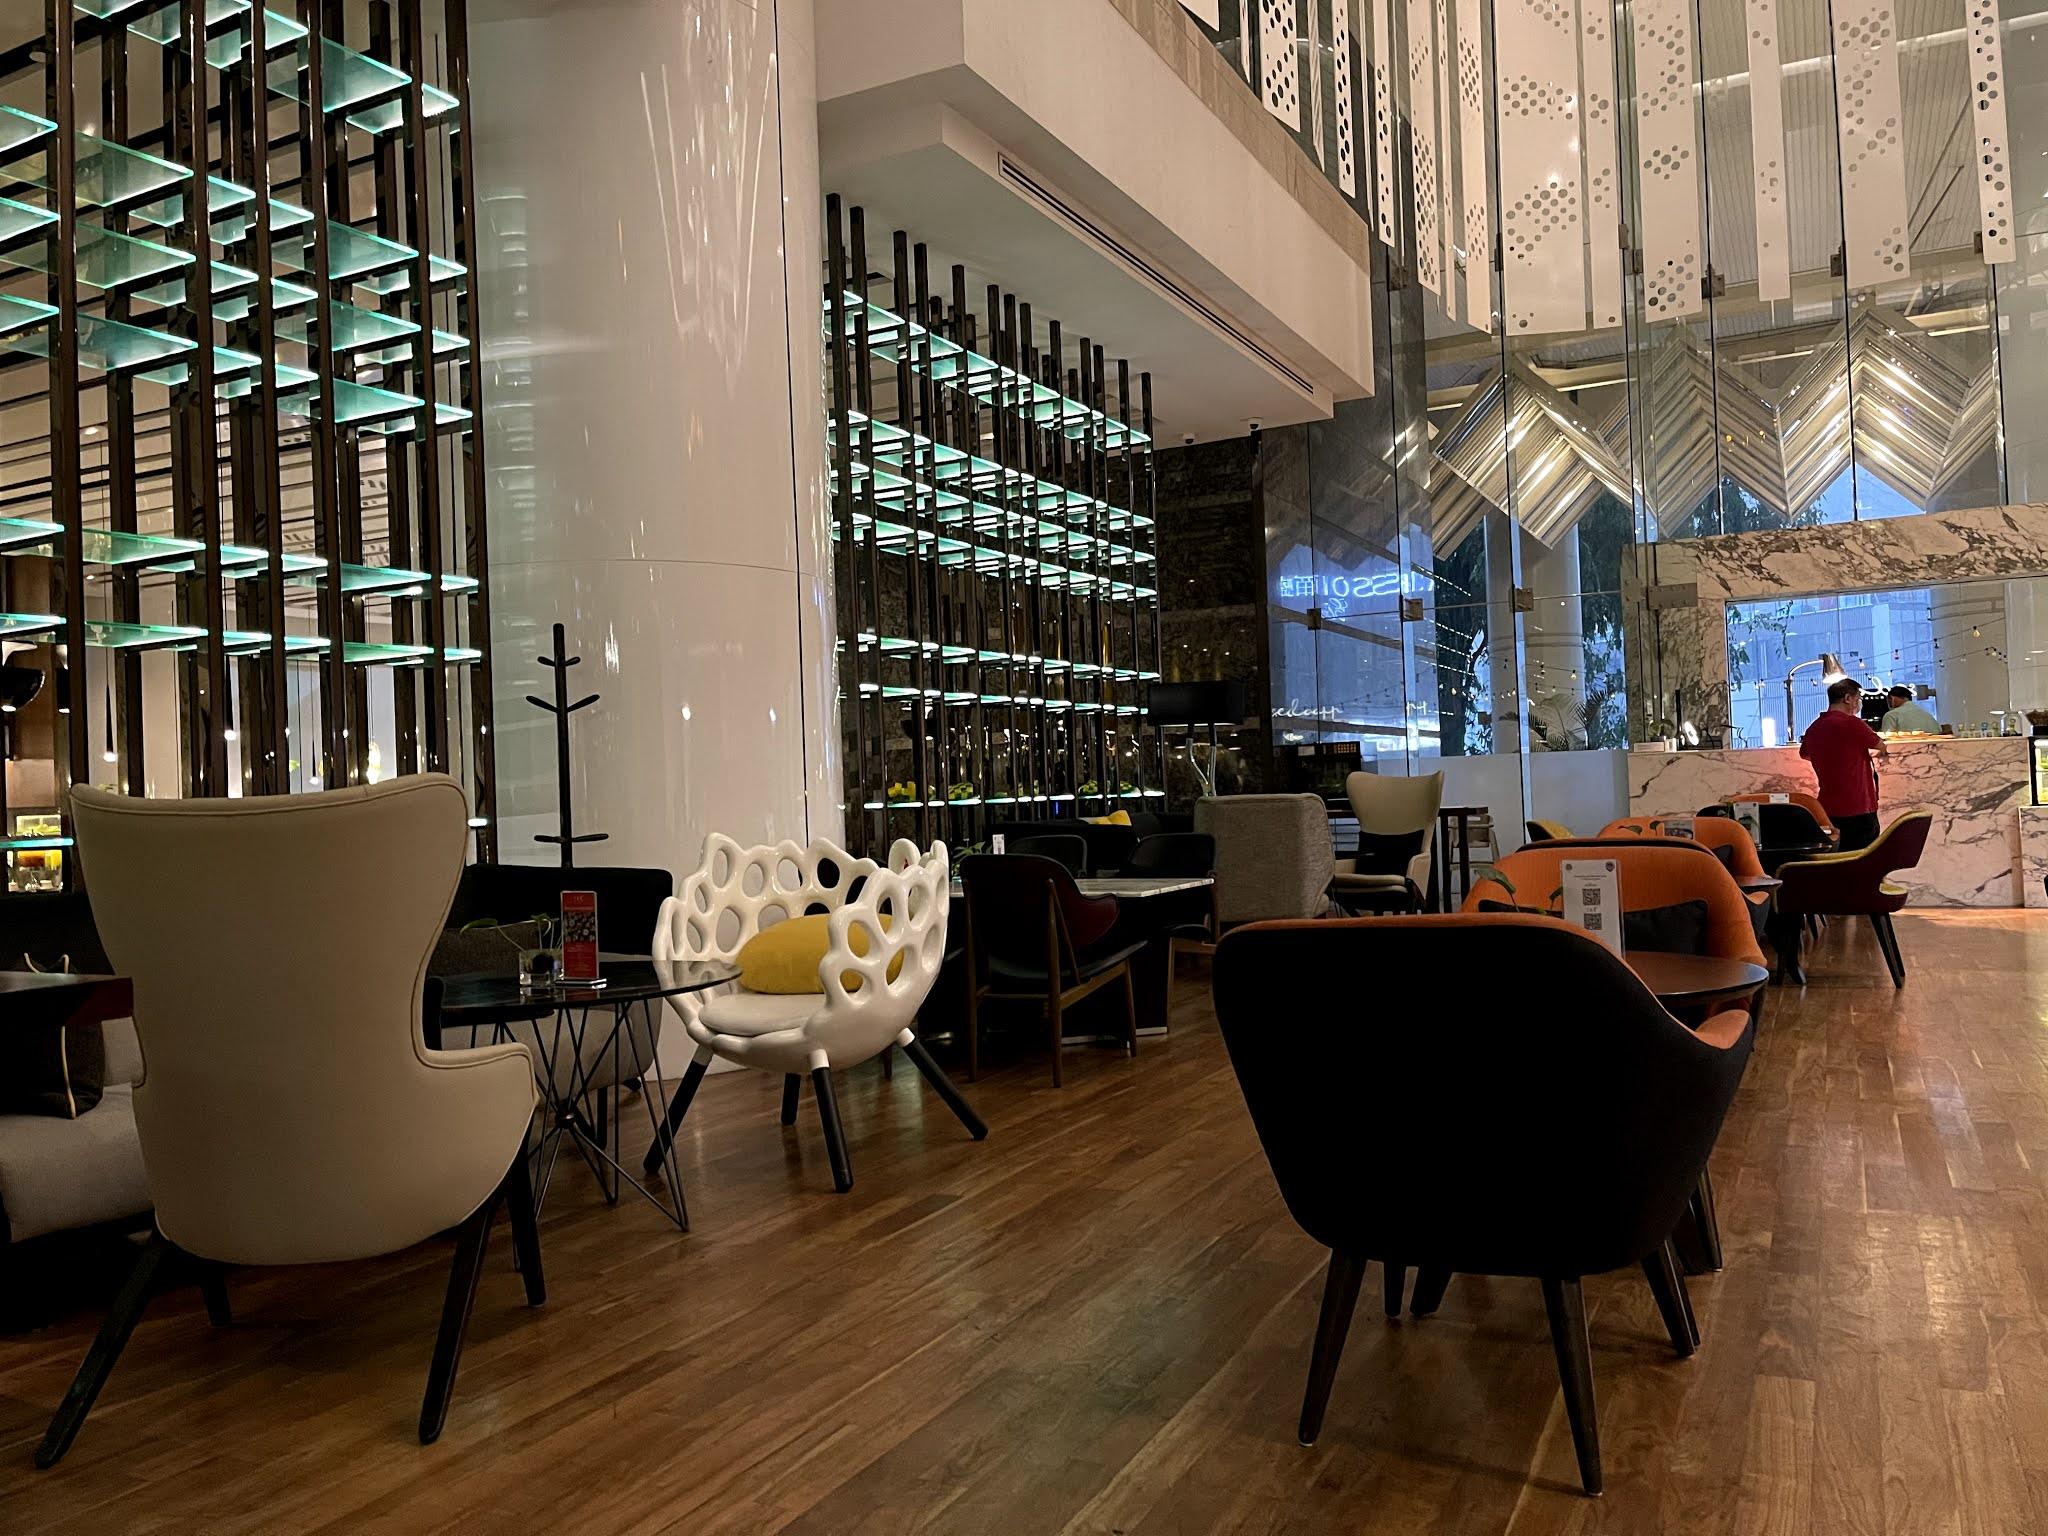 PROMOSI BUFET RAMADAN 2021 PULLMAN KUALA LUMPUR CITY CENTRE HOTEL & RESIDENCES (PULLMAN KLCC)